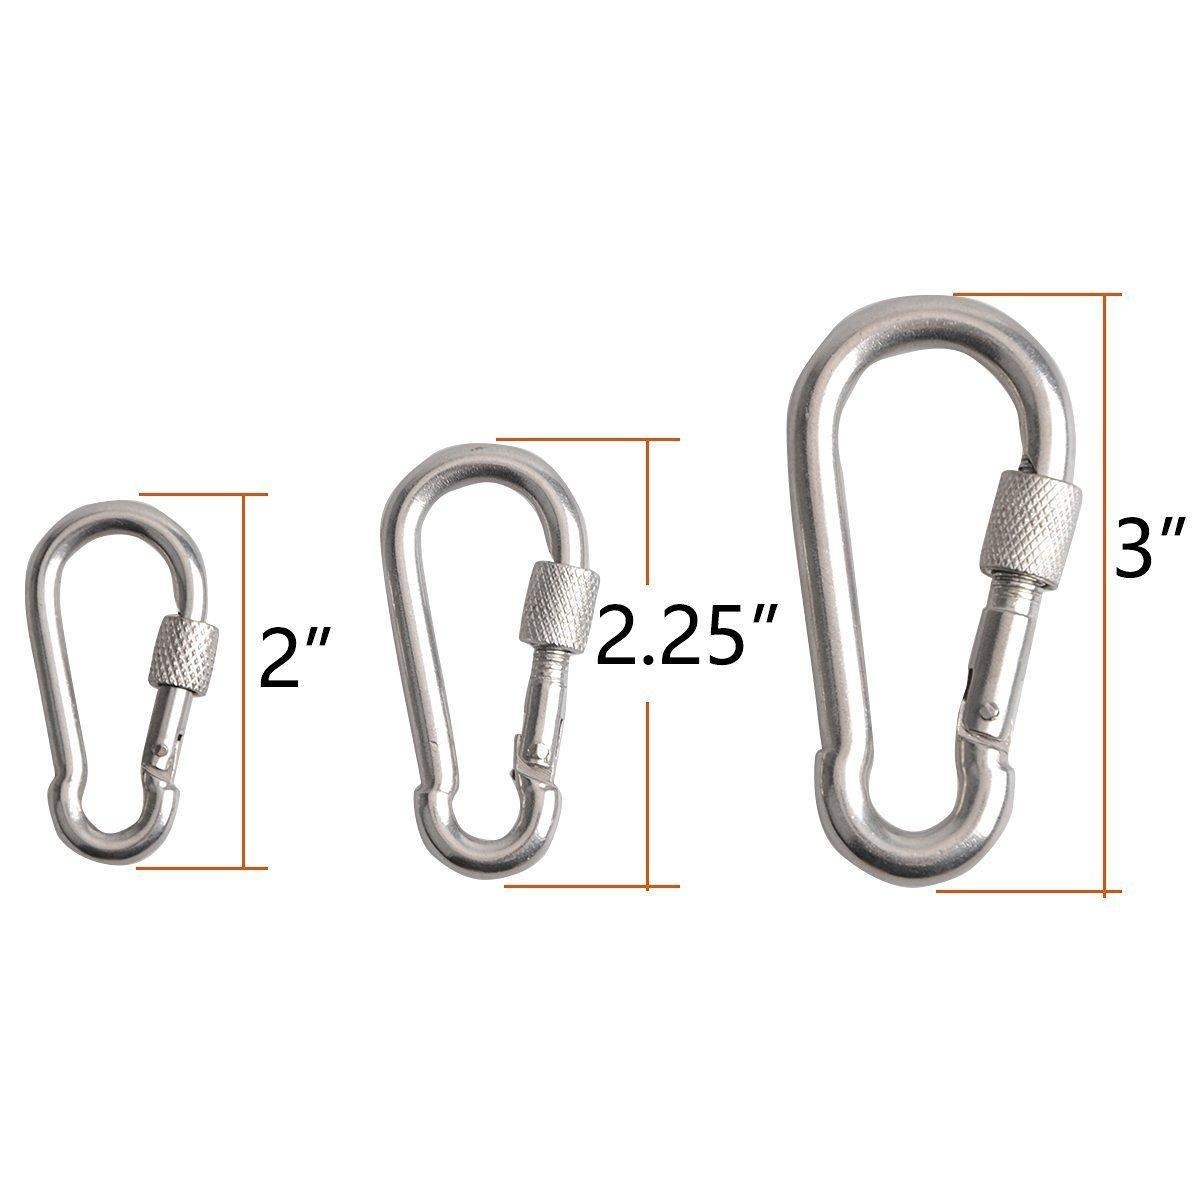 Online Store Triwonder Stainless Steel 304 Spring Snap